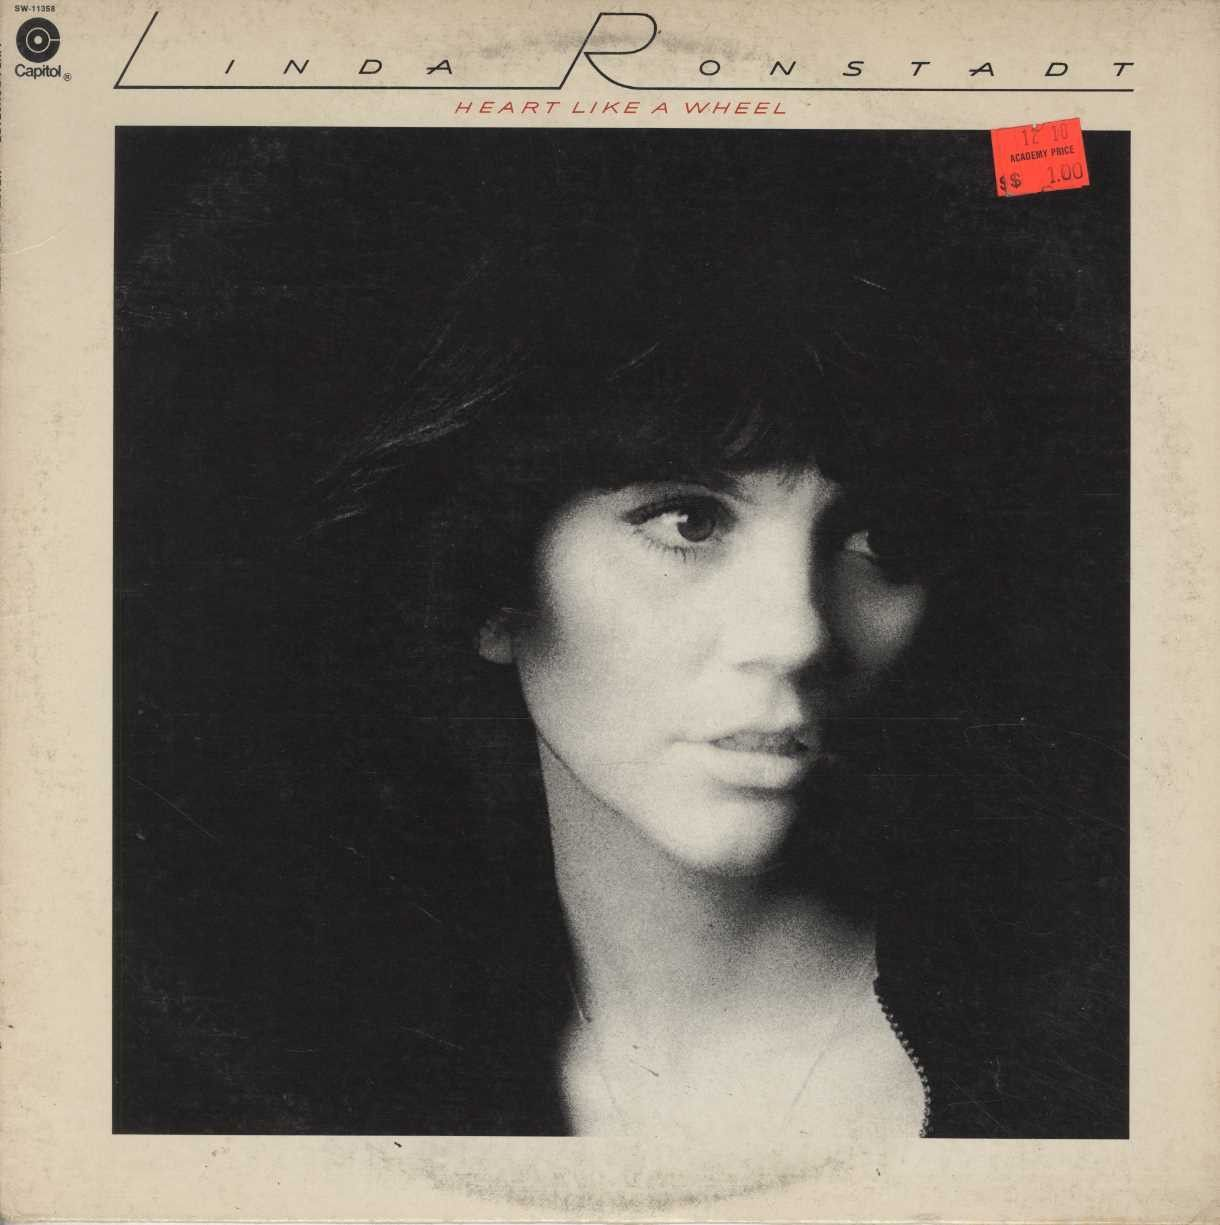 Linda Ronstadt Heart Like A Wheel Linda ronstadt songs